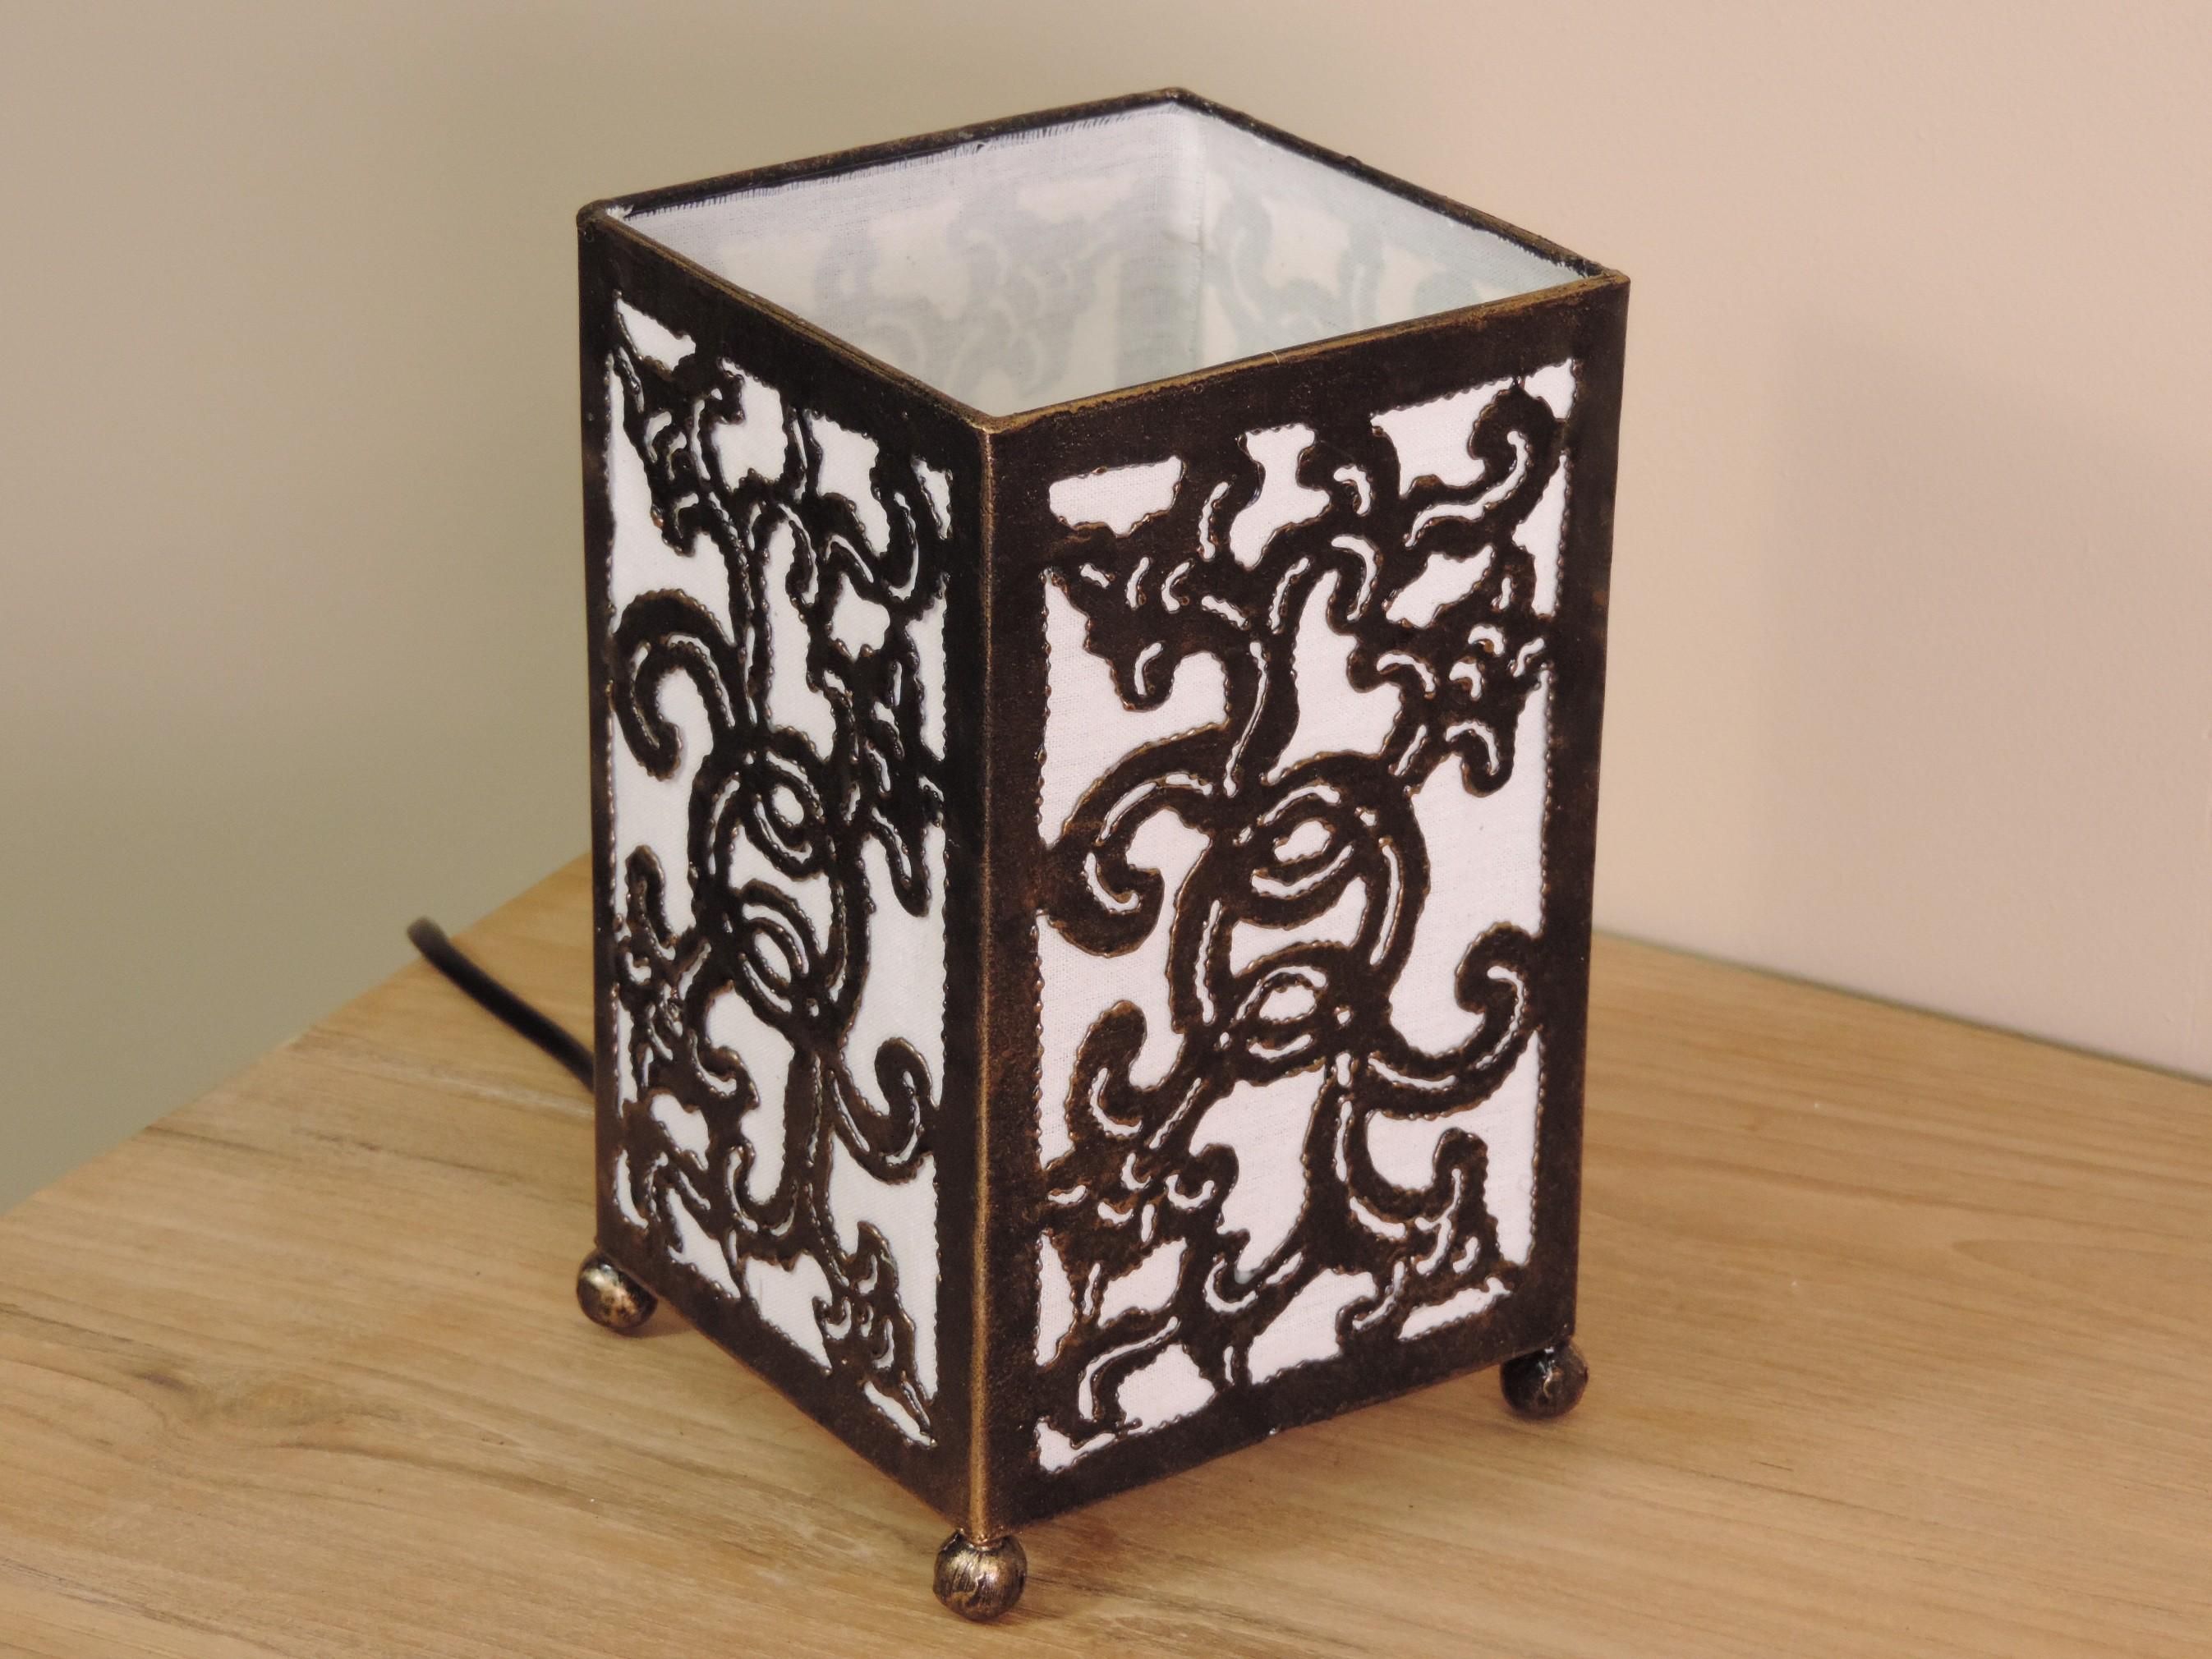 Lampe en fer forg rectangle blanc 12 cm hauteur 20 cm - Lampe fer forge ...